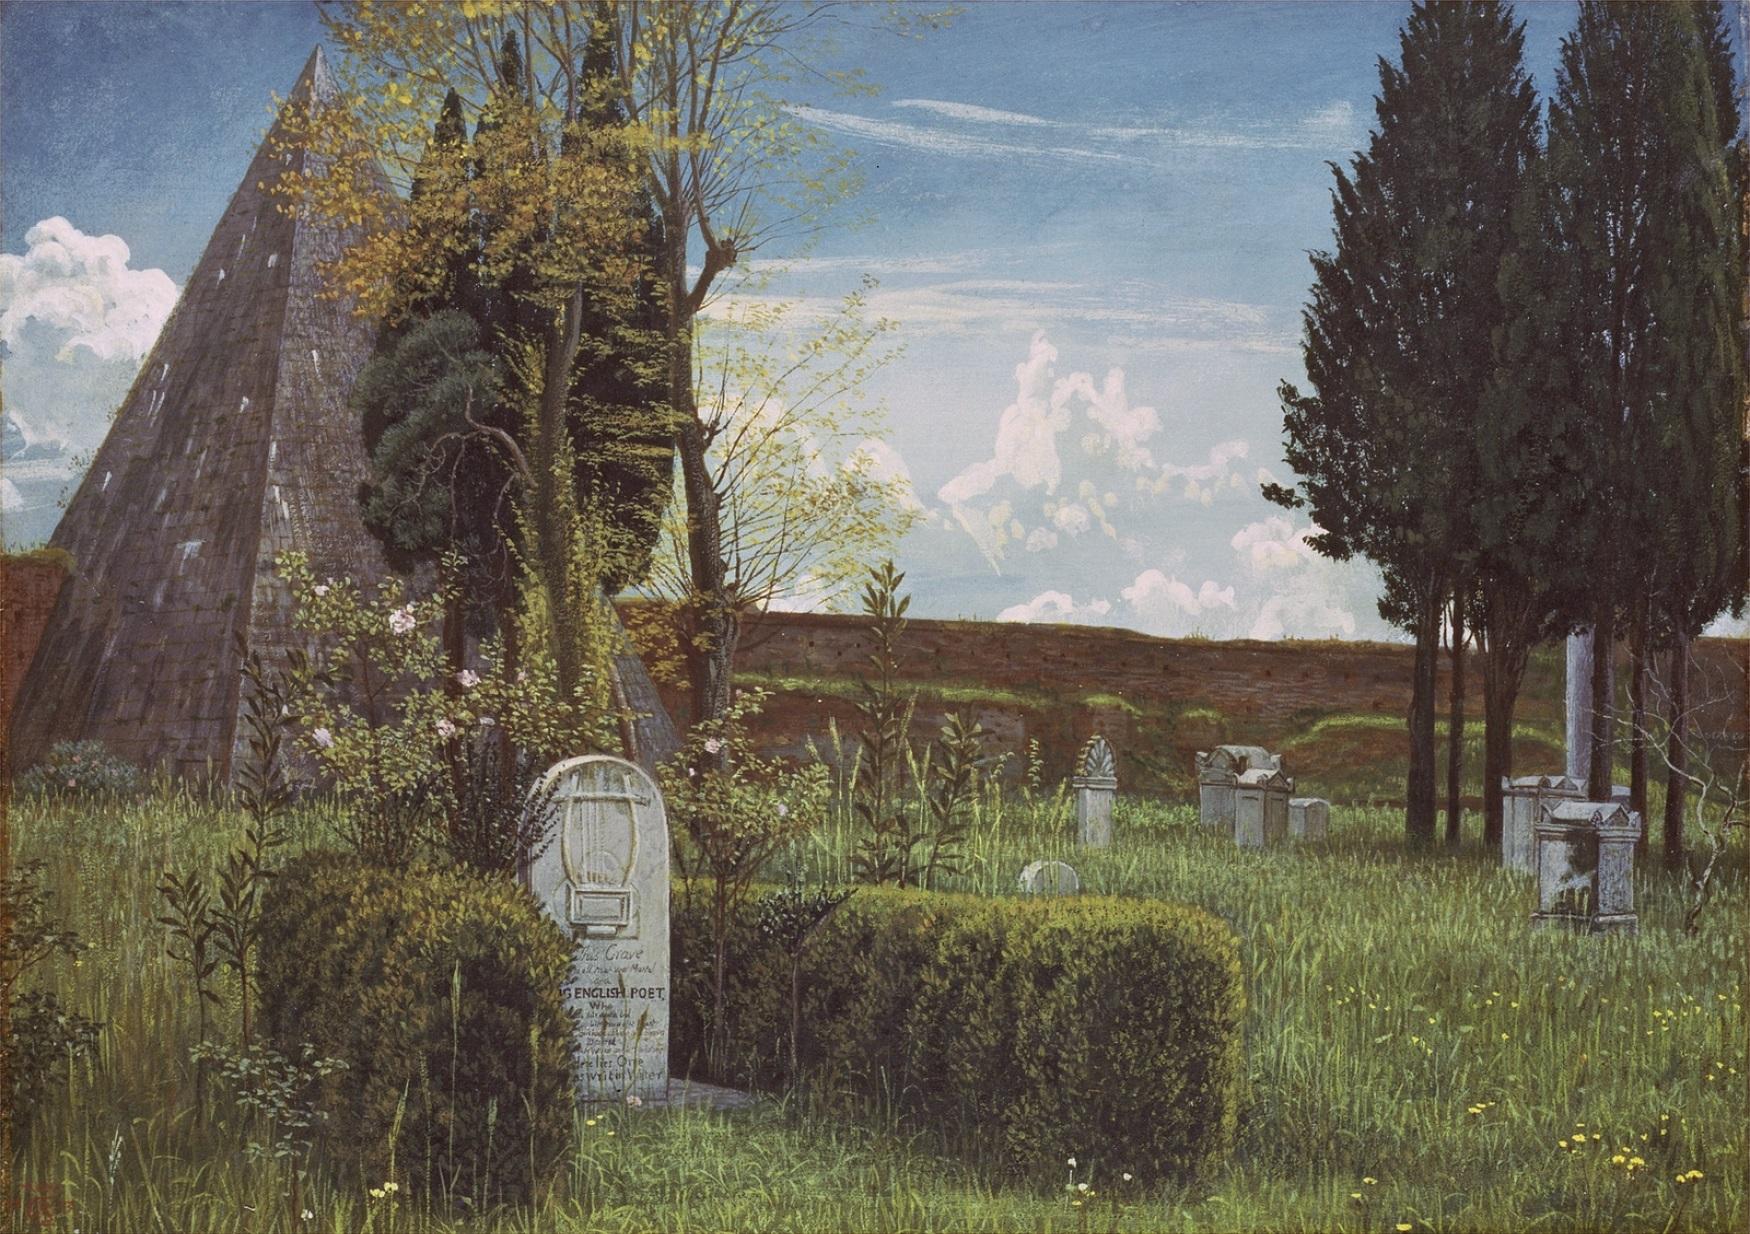 http://upload.wikimedia.org/wikipedia/commons/b/b7/Crane_Protestant_Cemetery.jpg